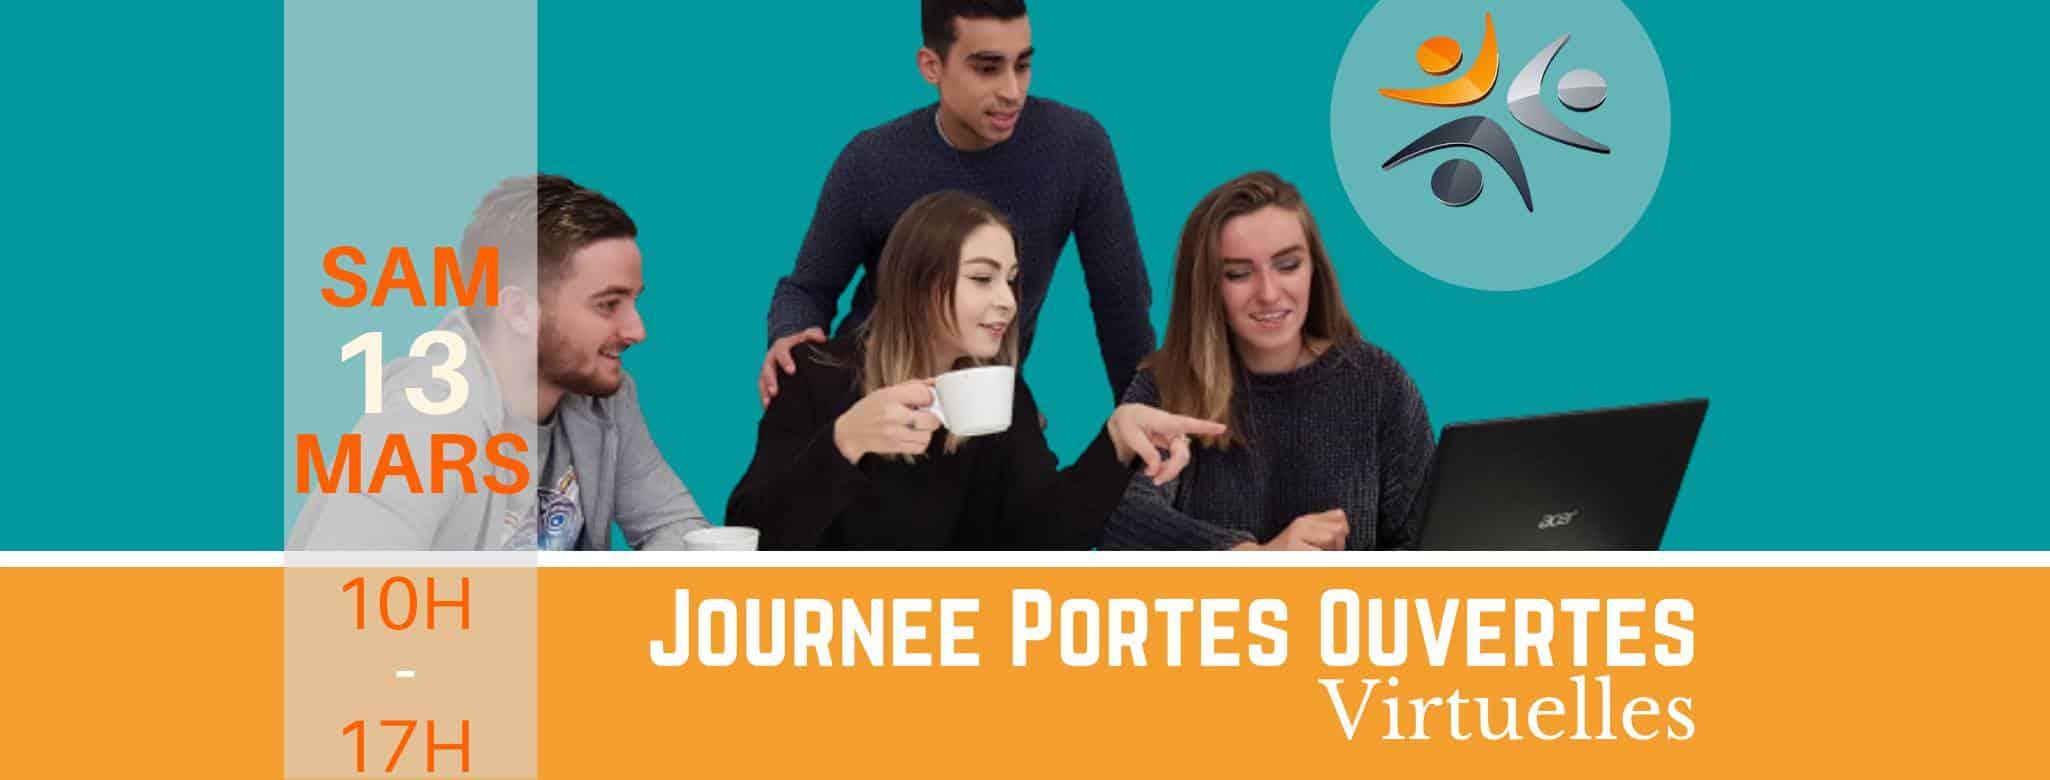 Porte_Ouverte_Nimes_Alternance_Sud Formation_Conseil